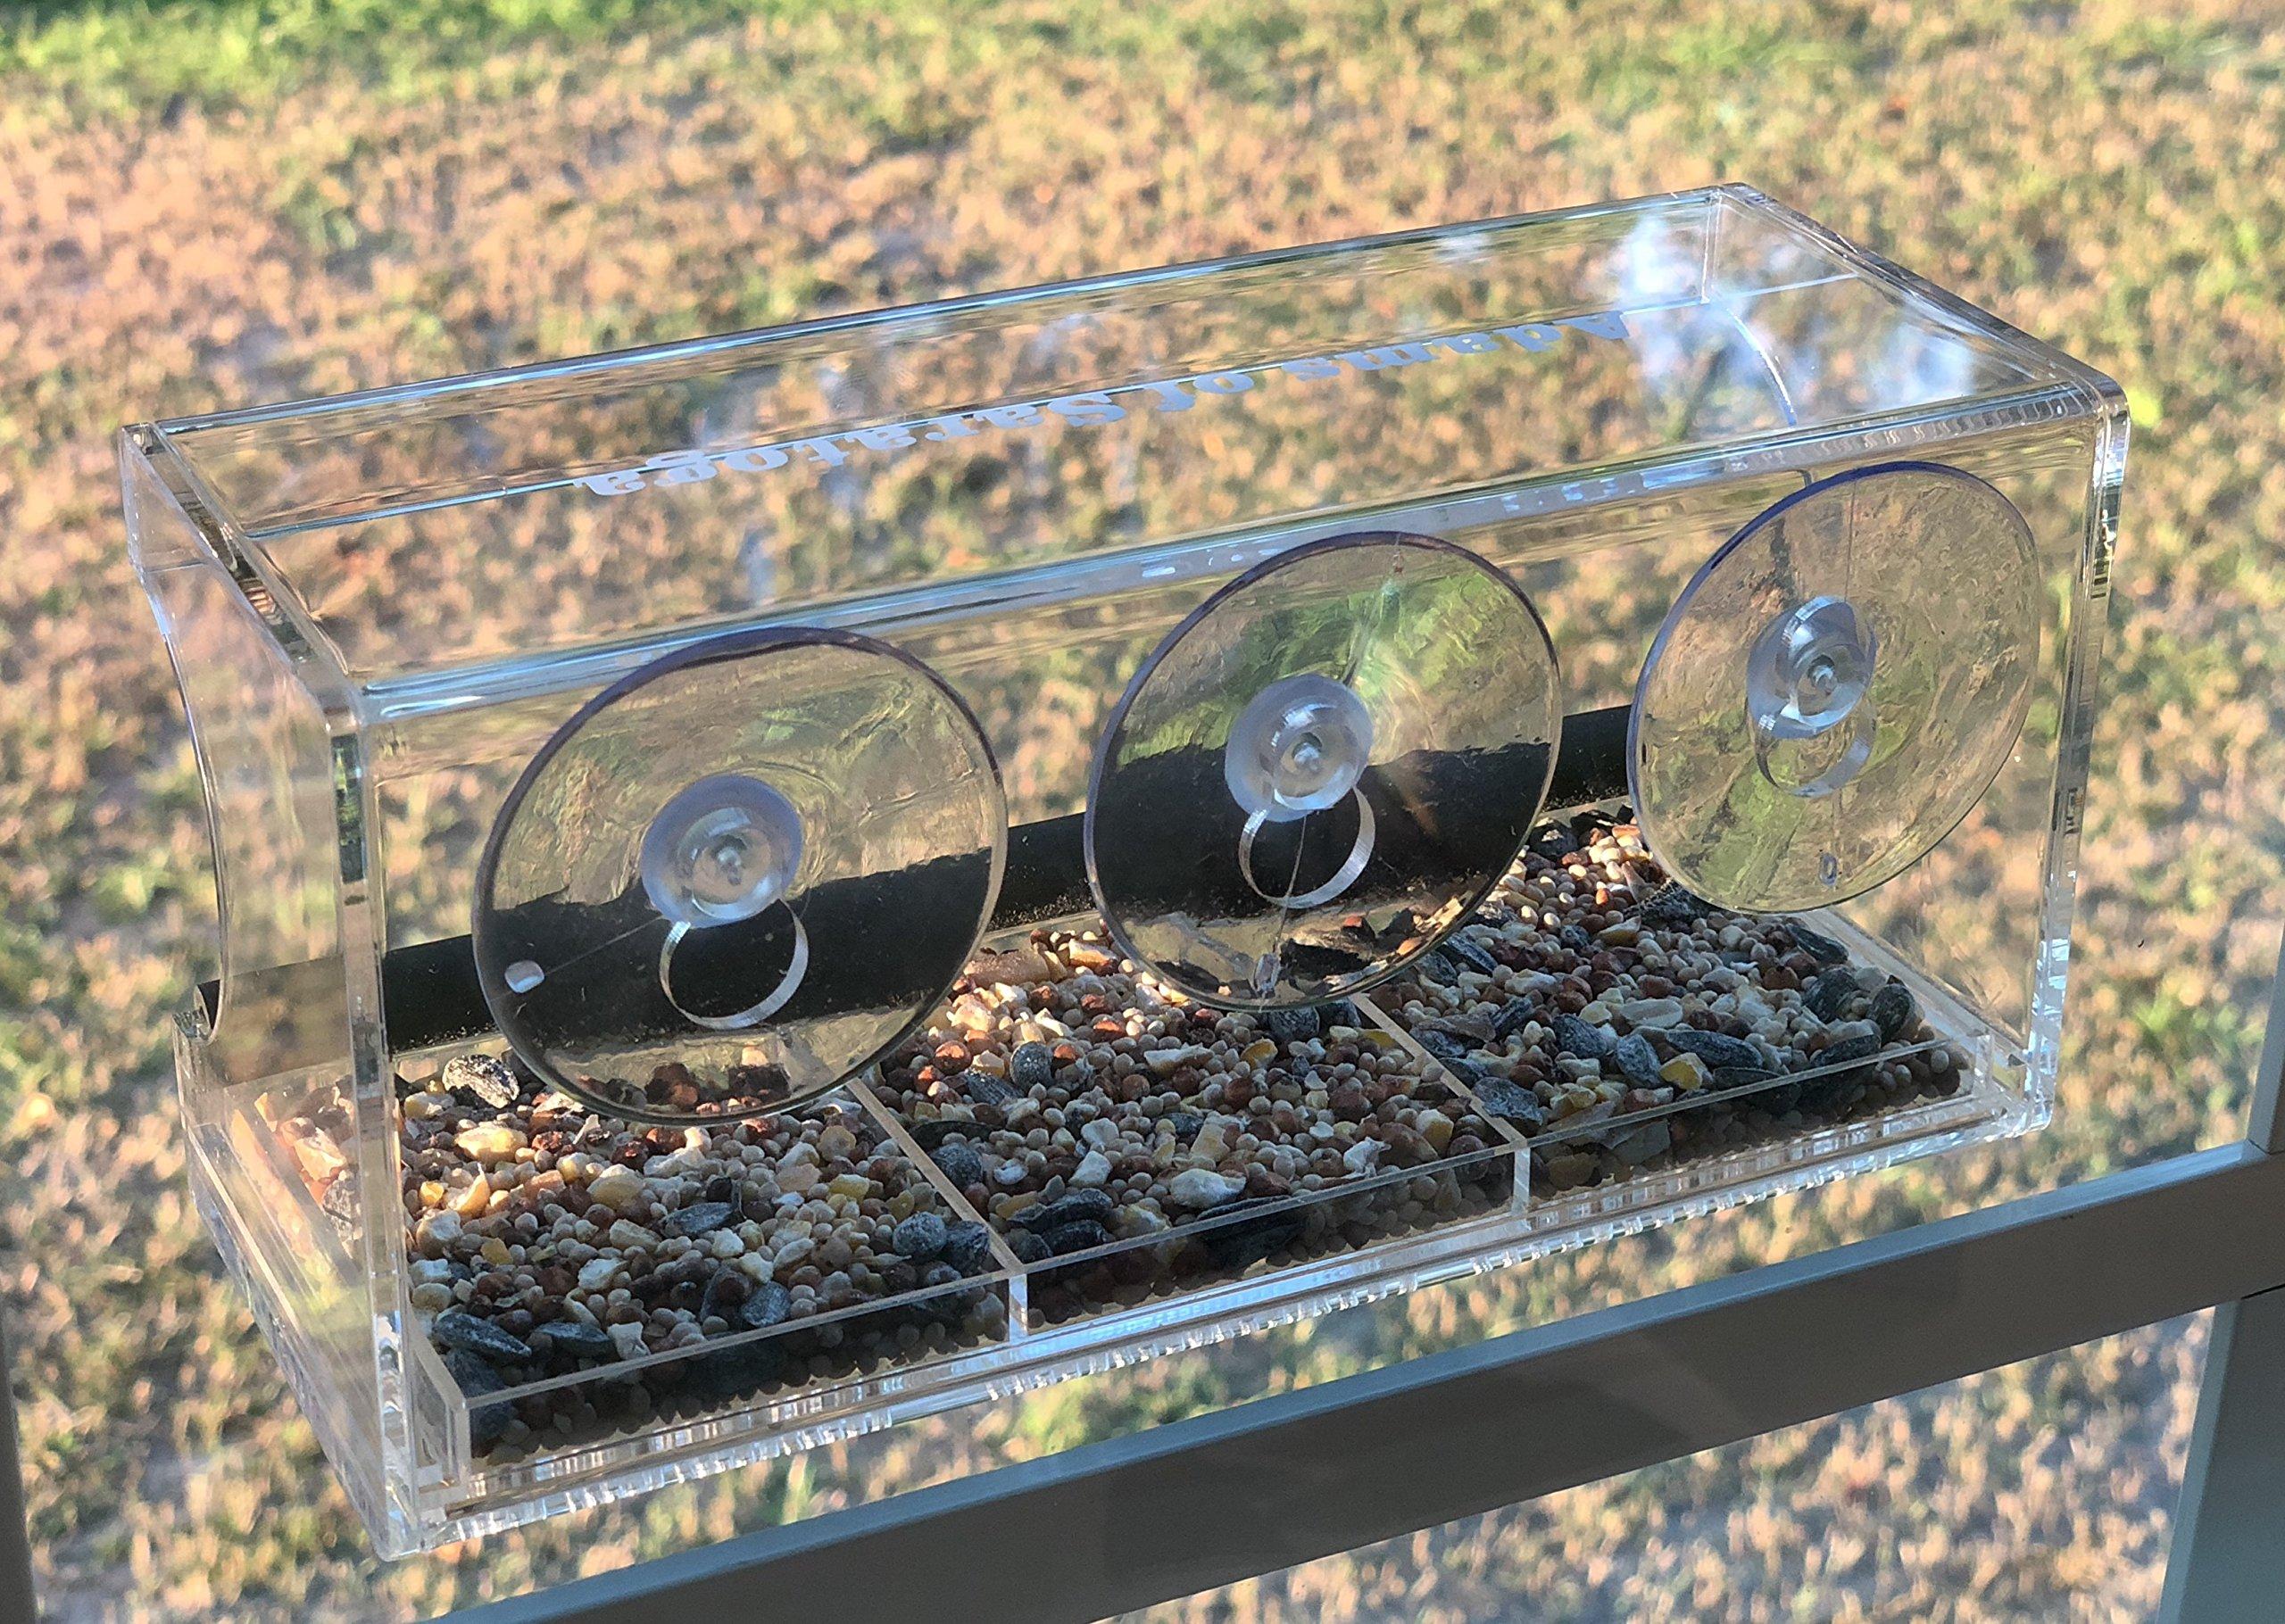 Adams of Saratoga - WINDOW BIRD FEEDER & FREE SEED - Strong Suction Cups, Seed Tray, Outdoor Bird Feeders for Wild Birds, Finch, Cardinal, Bluebird, Large Outside Birdhouse, Drain Holes